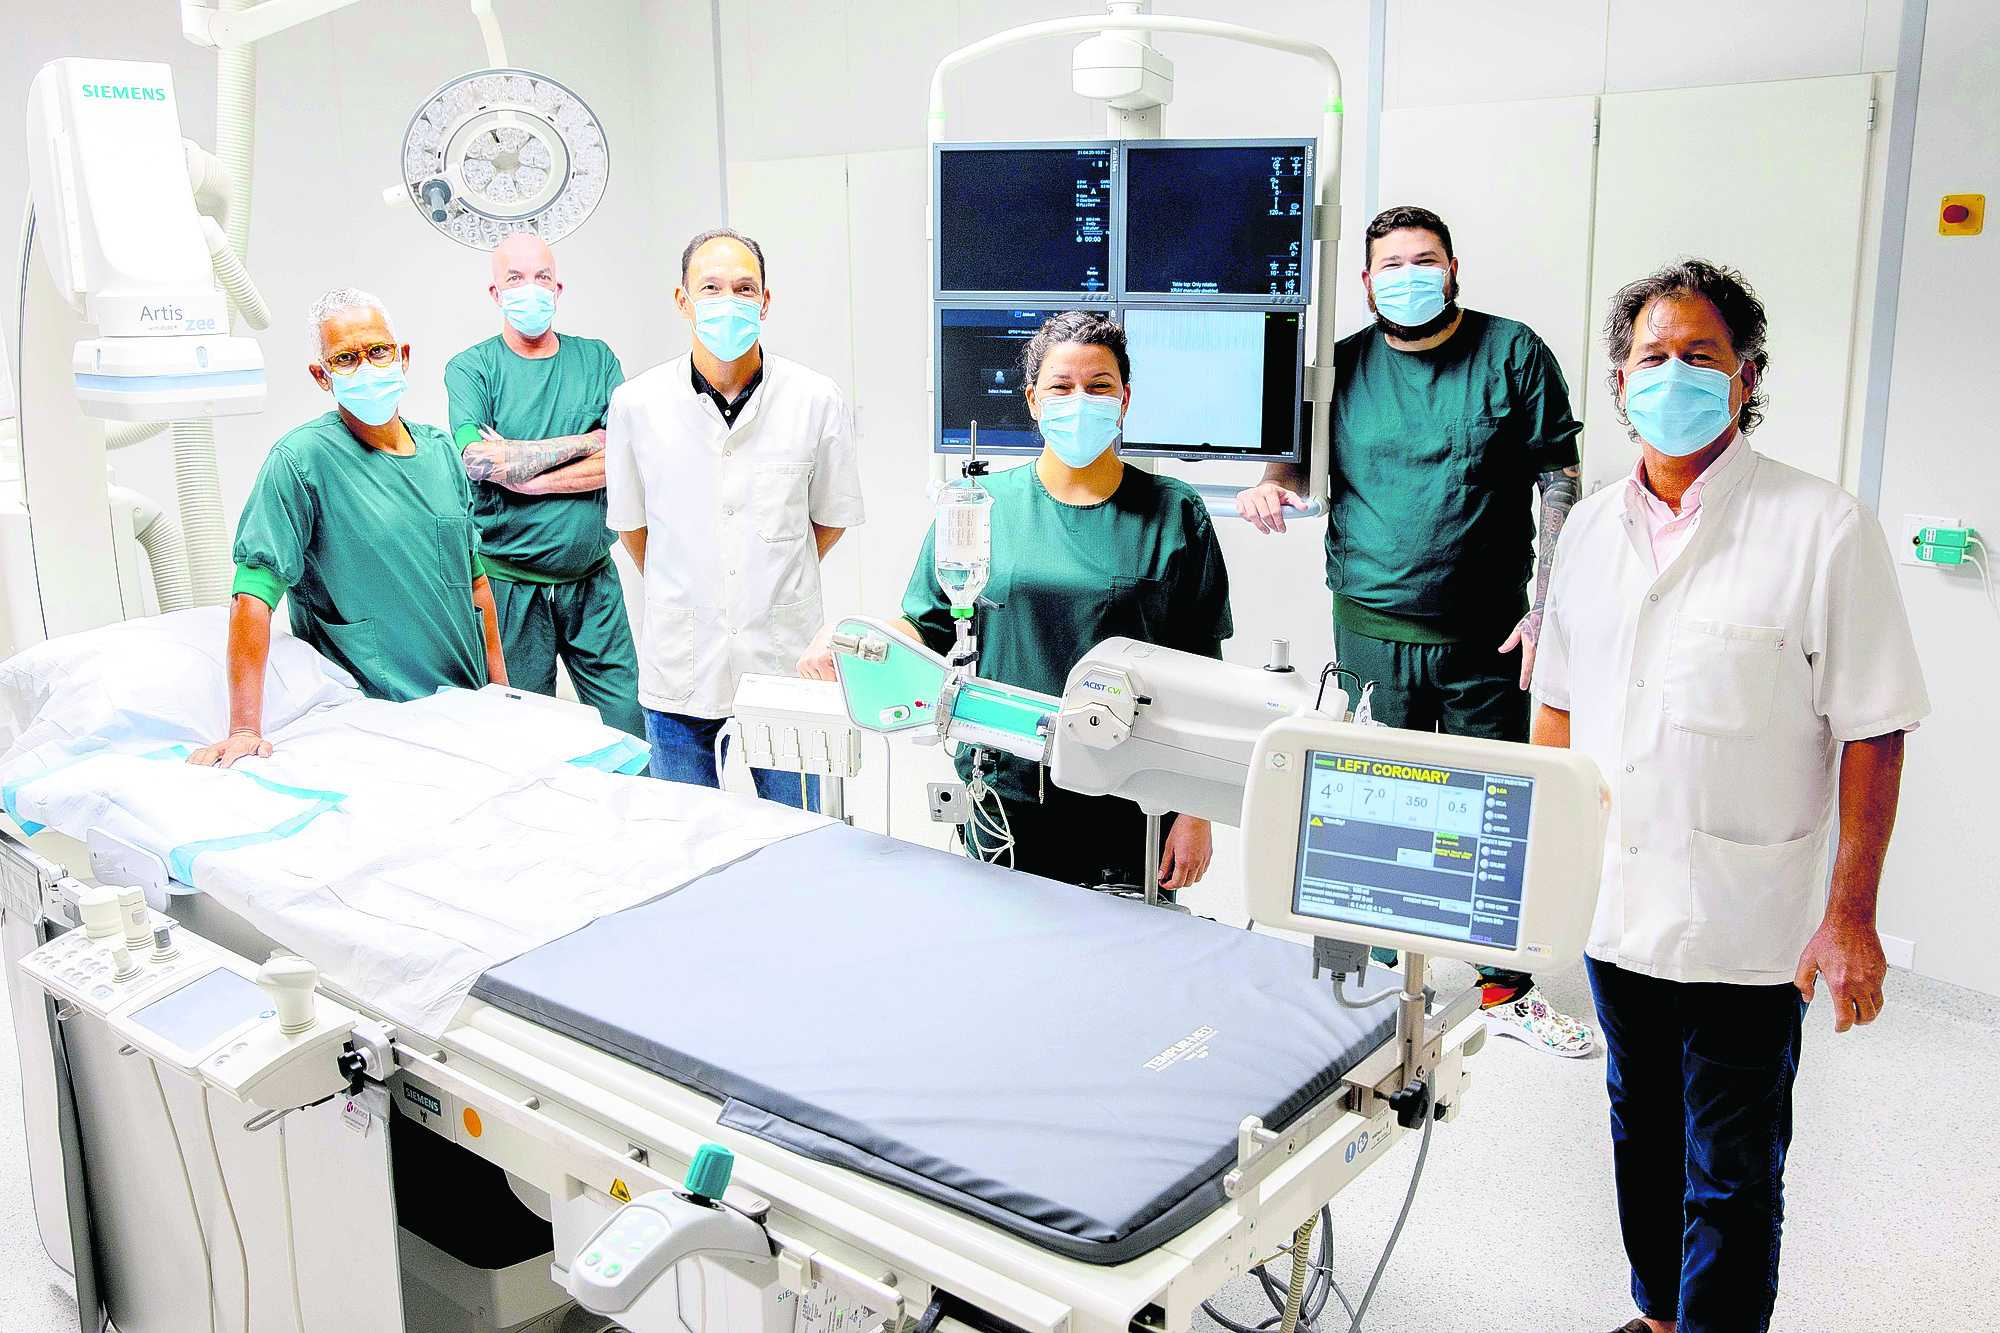 Tres aña pasa a start cu intervencion di cardiologia na HOH; Den menos di 90 minuut ta habri ader despues di ataca di curason